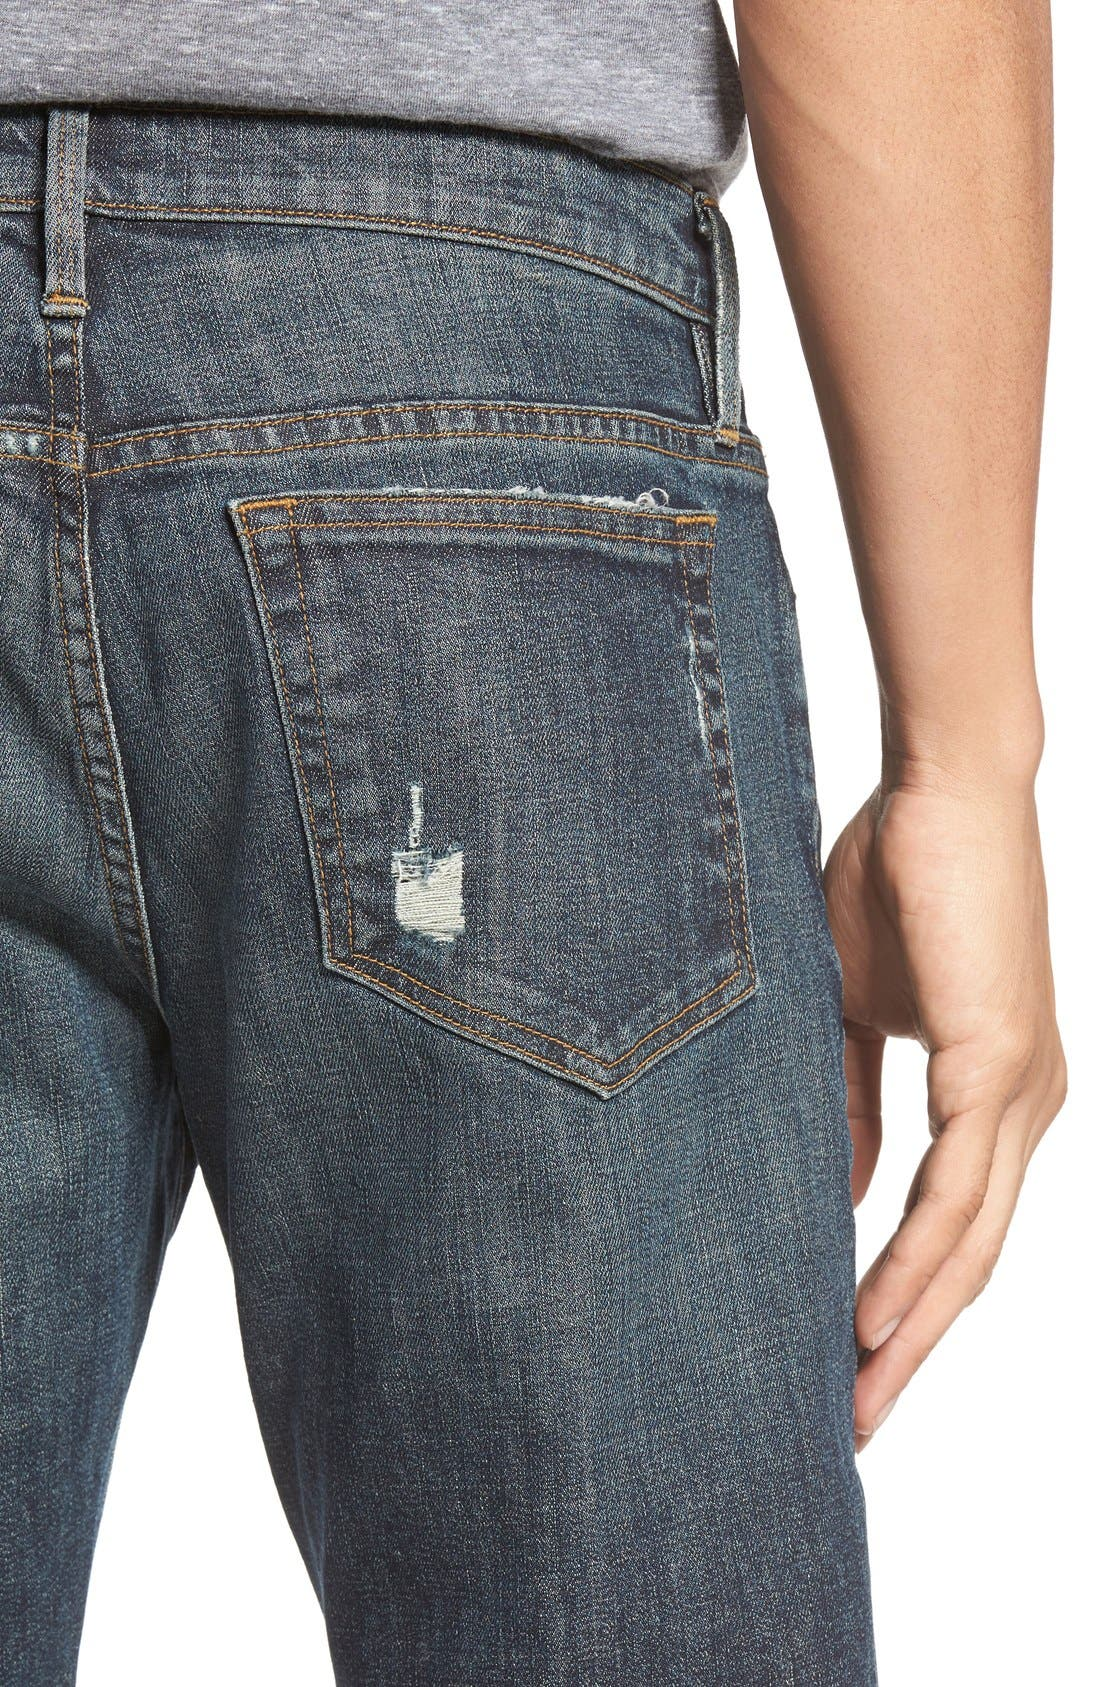 L'Homme Slim Fit Jeans,                             Alternate thumbnail 4, color,                             Fort Davis